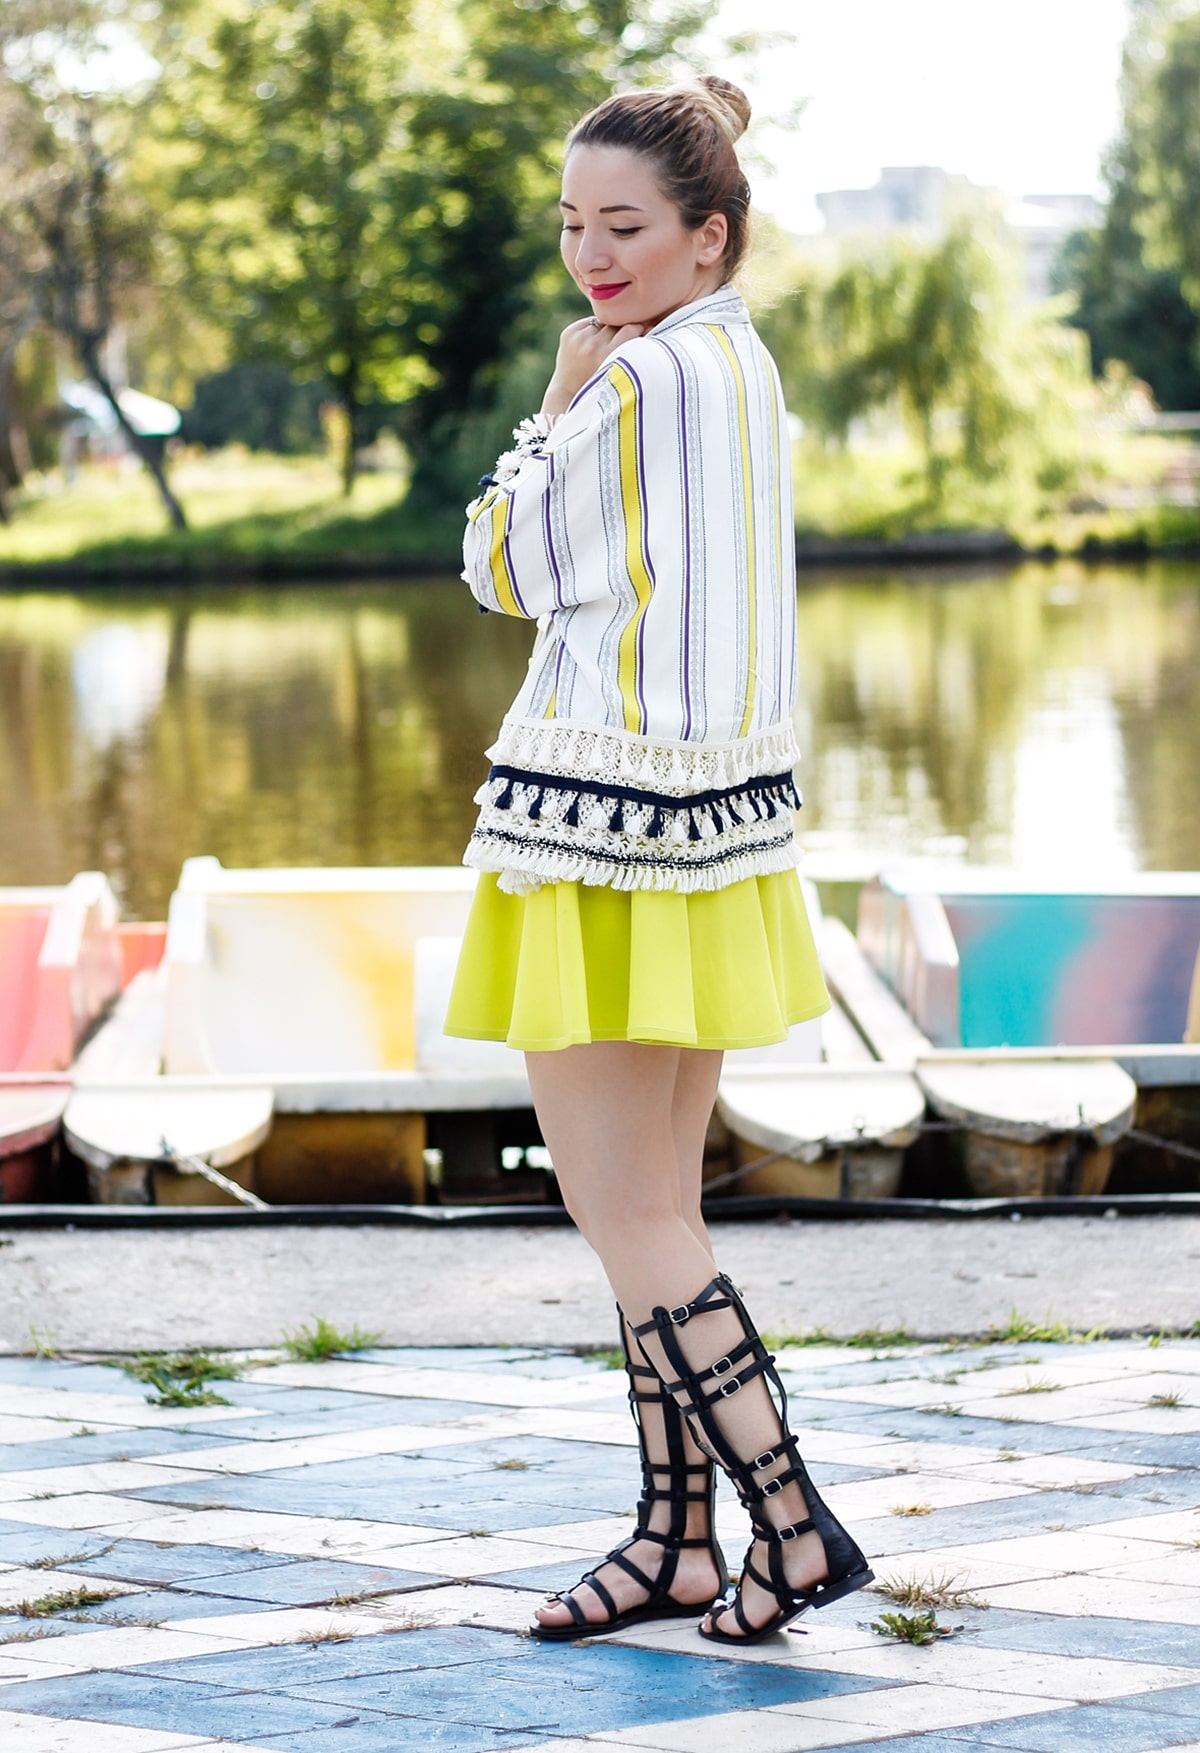 Street style: summer look, neon yellow skirt, stripes kimono, pom-poms, gladiator sandals, fashion blogger andreea ristea